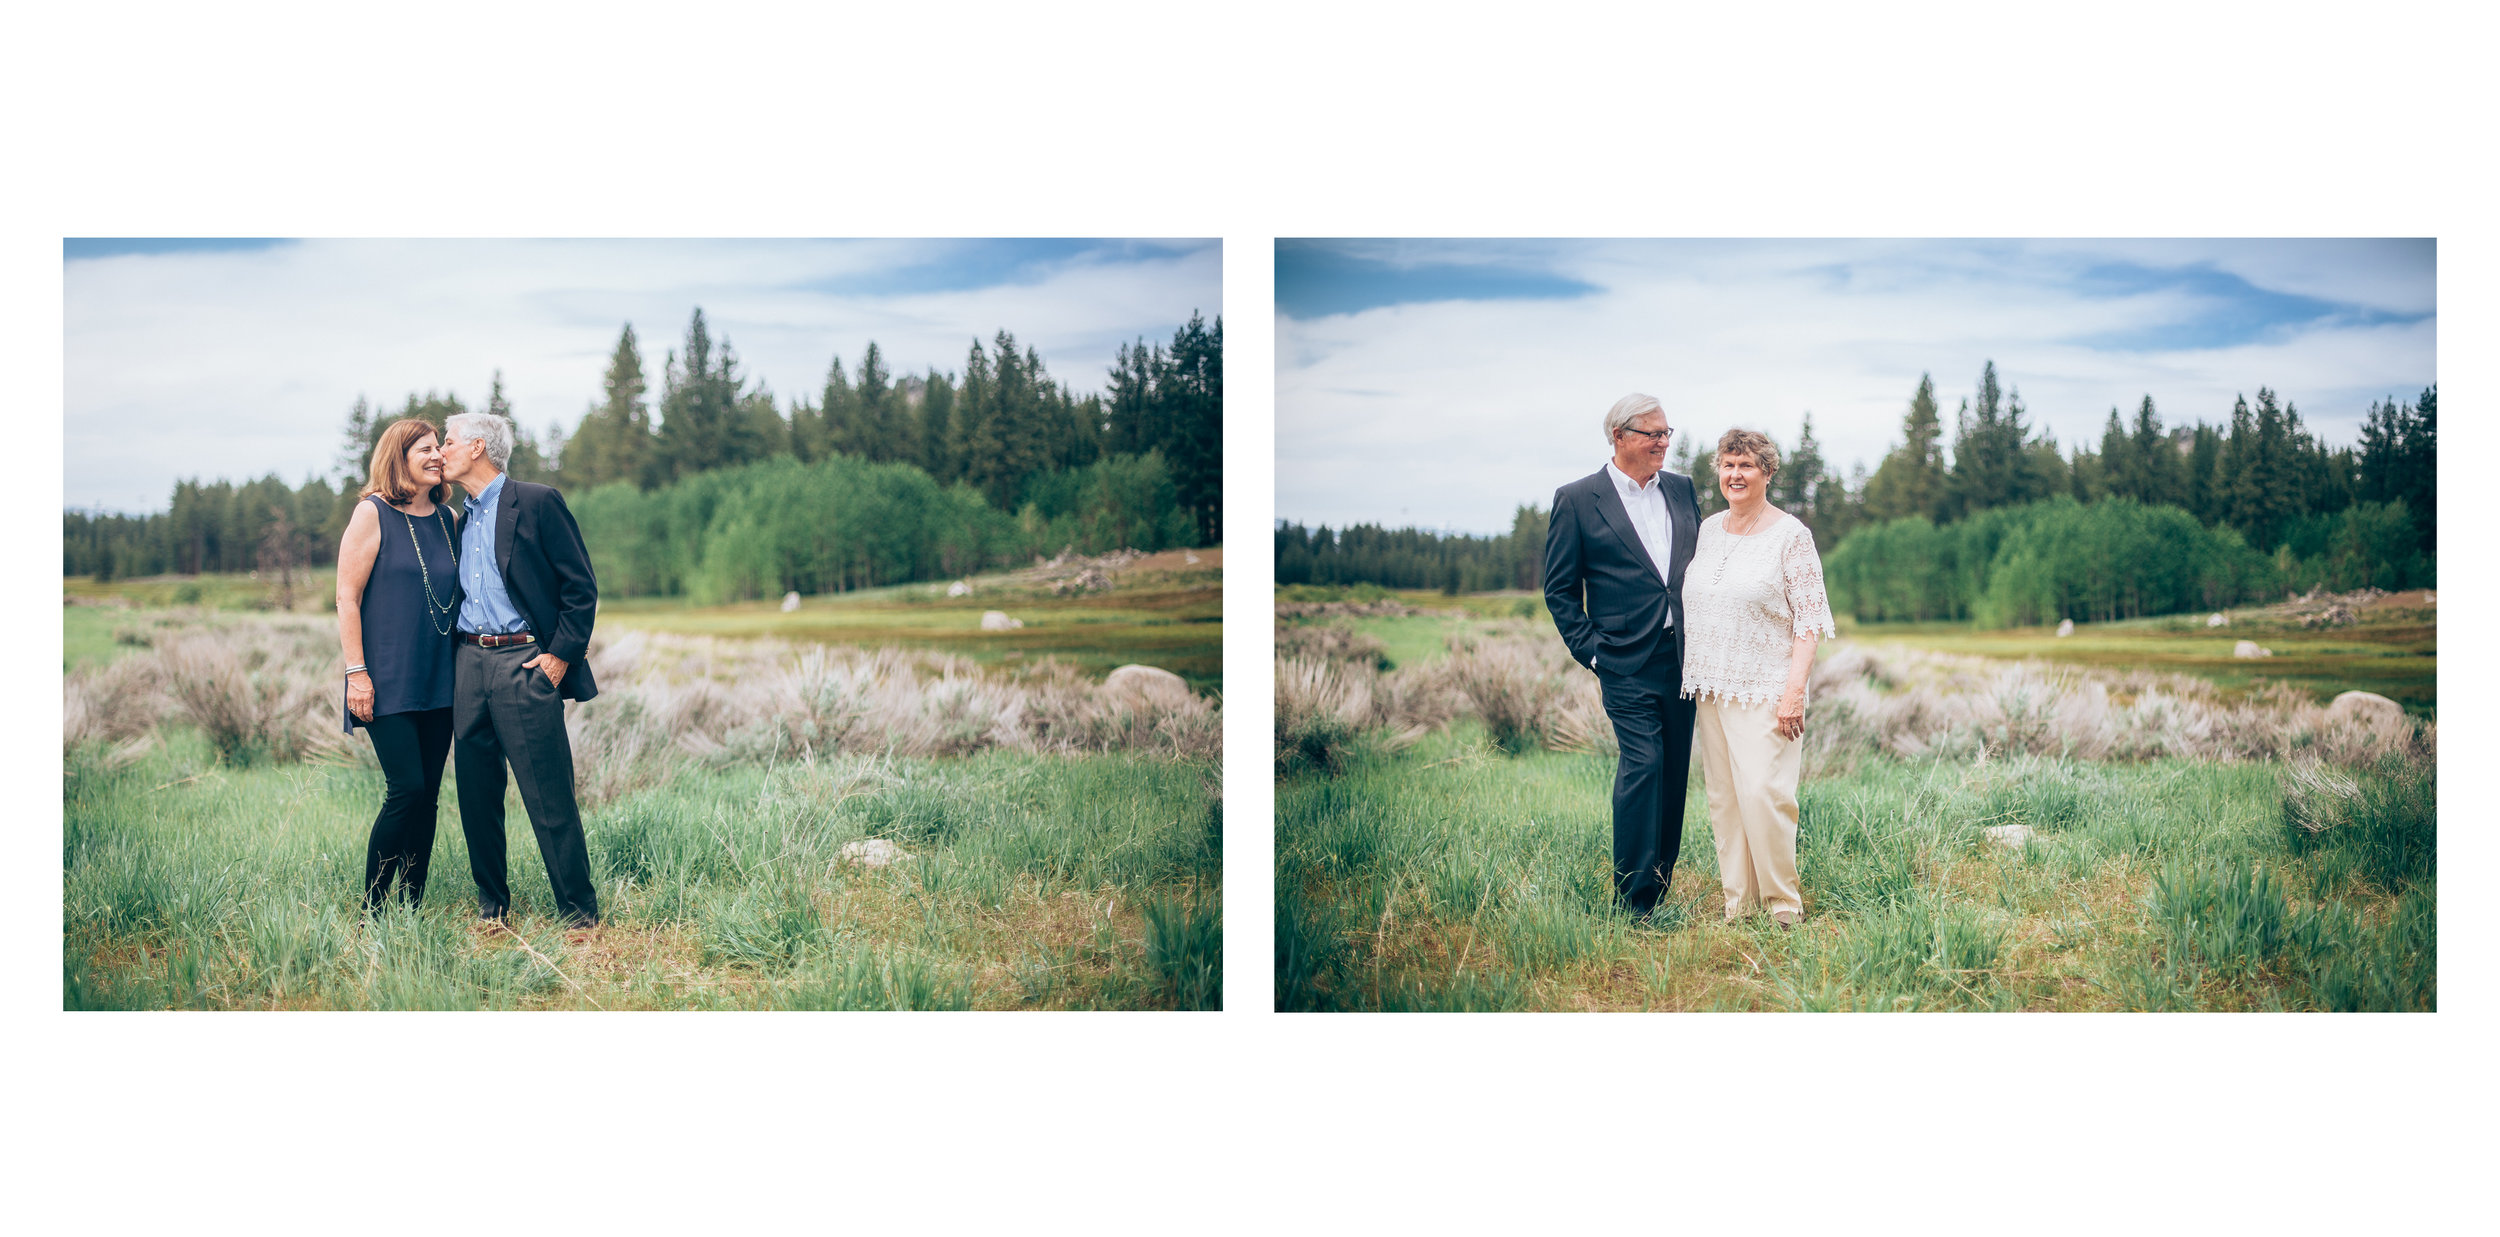 Melisa&David_Wedding_Day_012.jpg